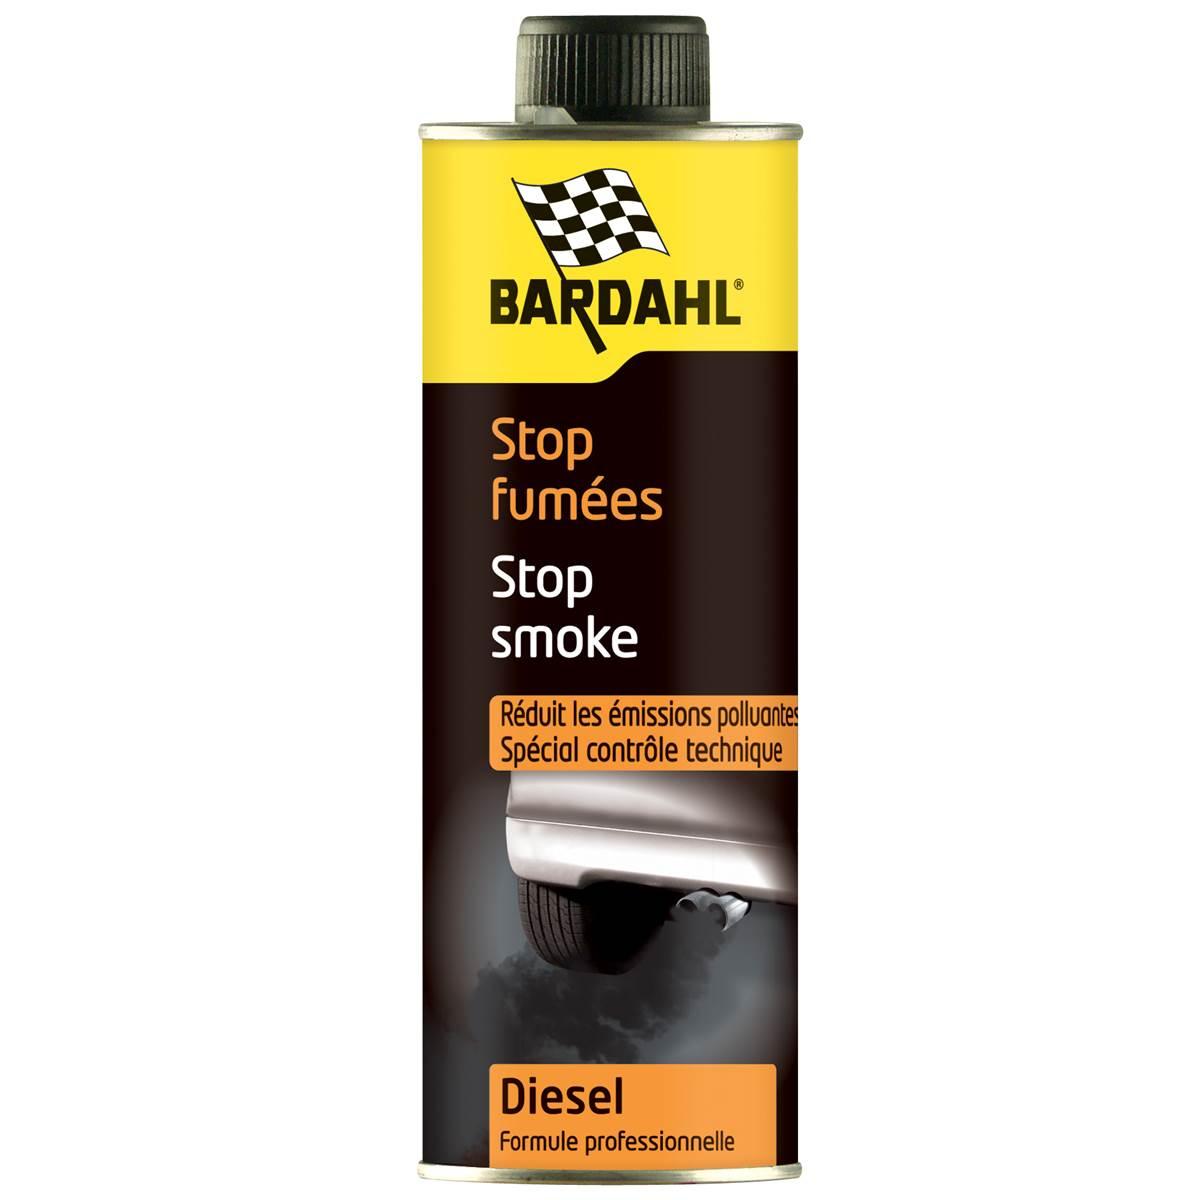 Anti-fumée Diesel Bardahl 500 ml